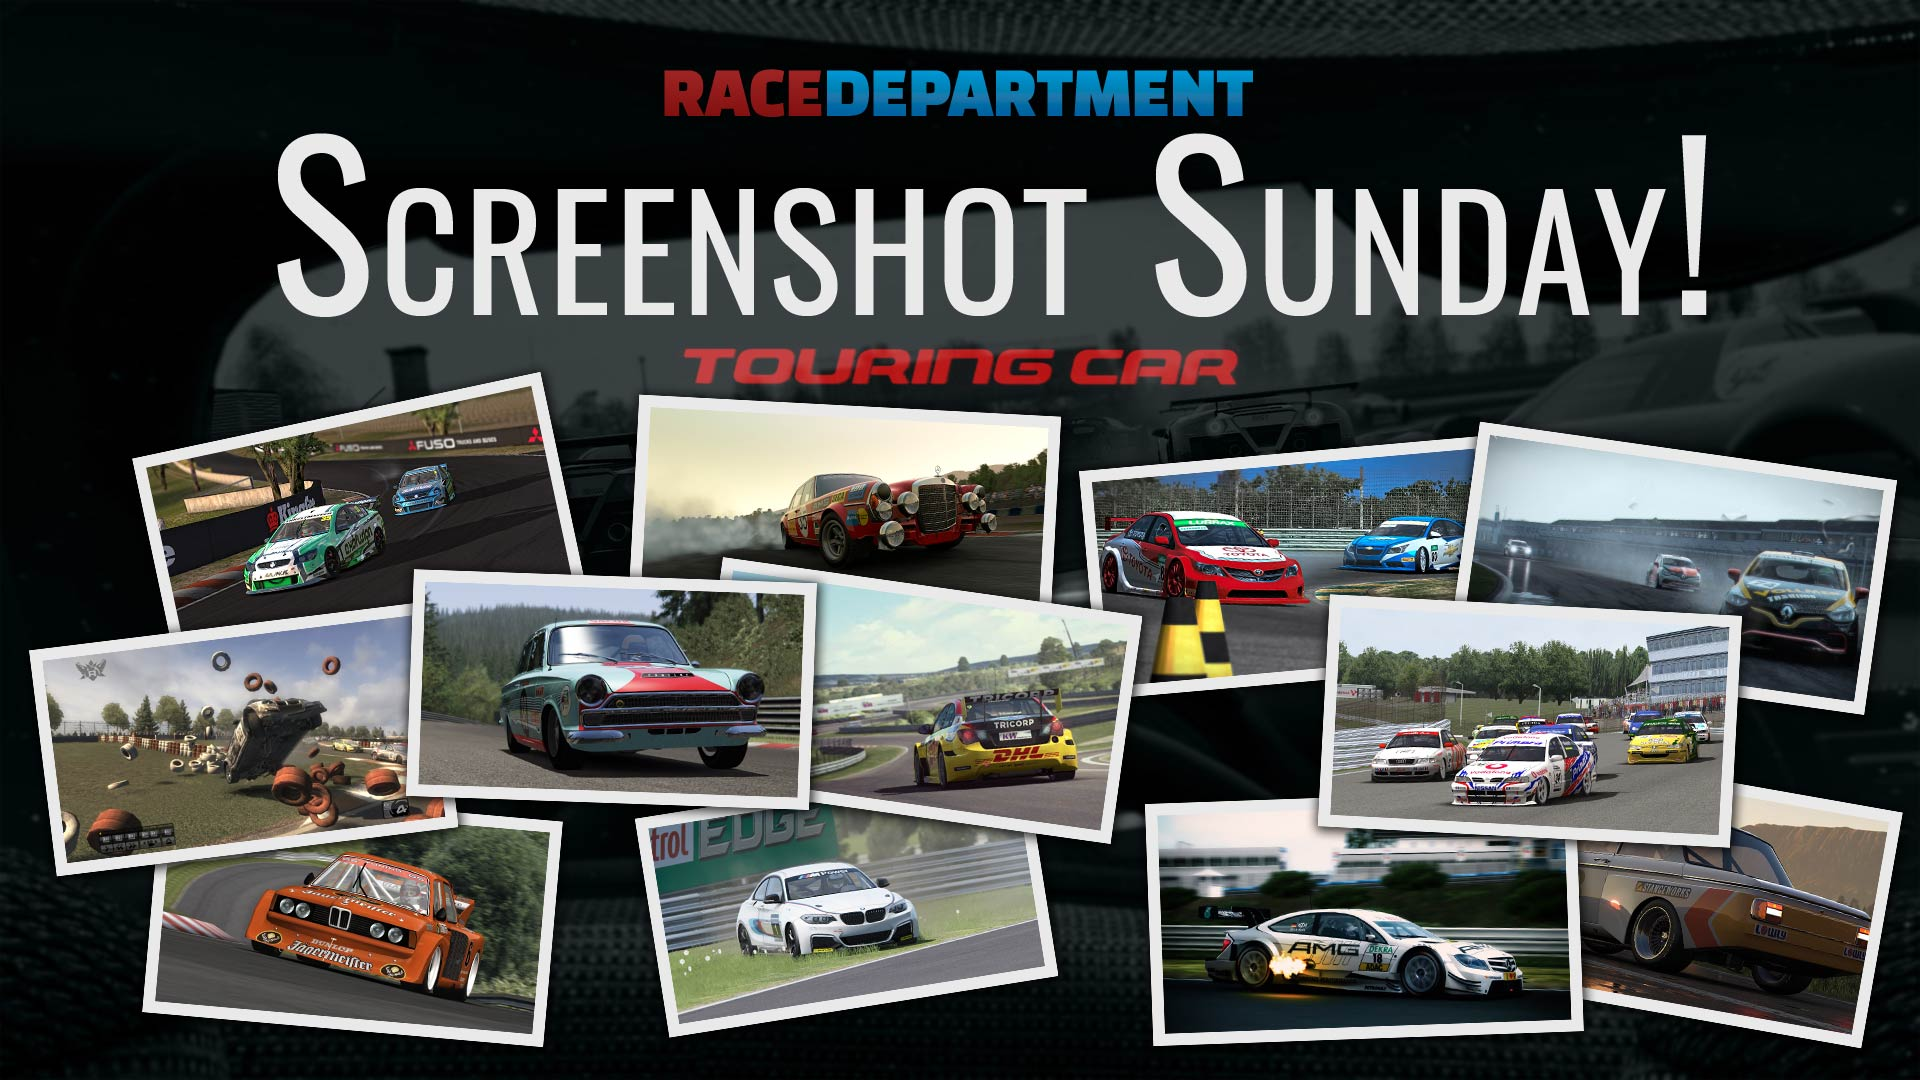 Screenshot Sunday - Touring Cars.jpg